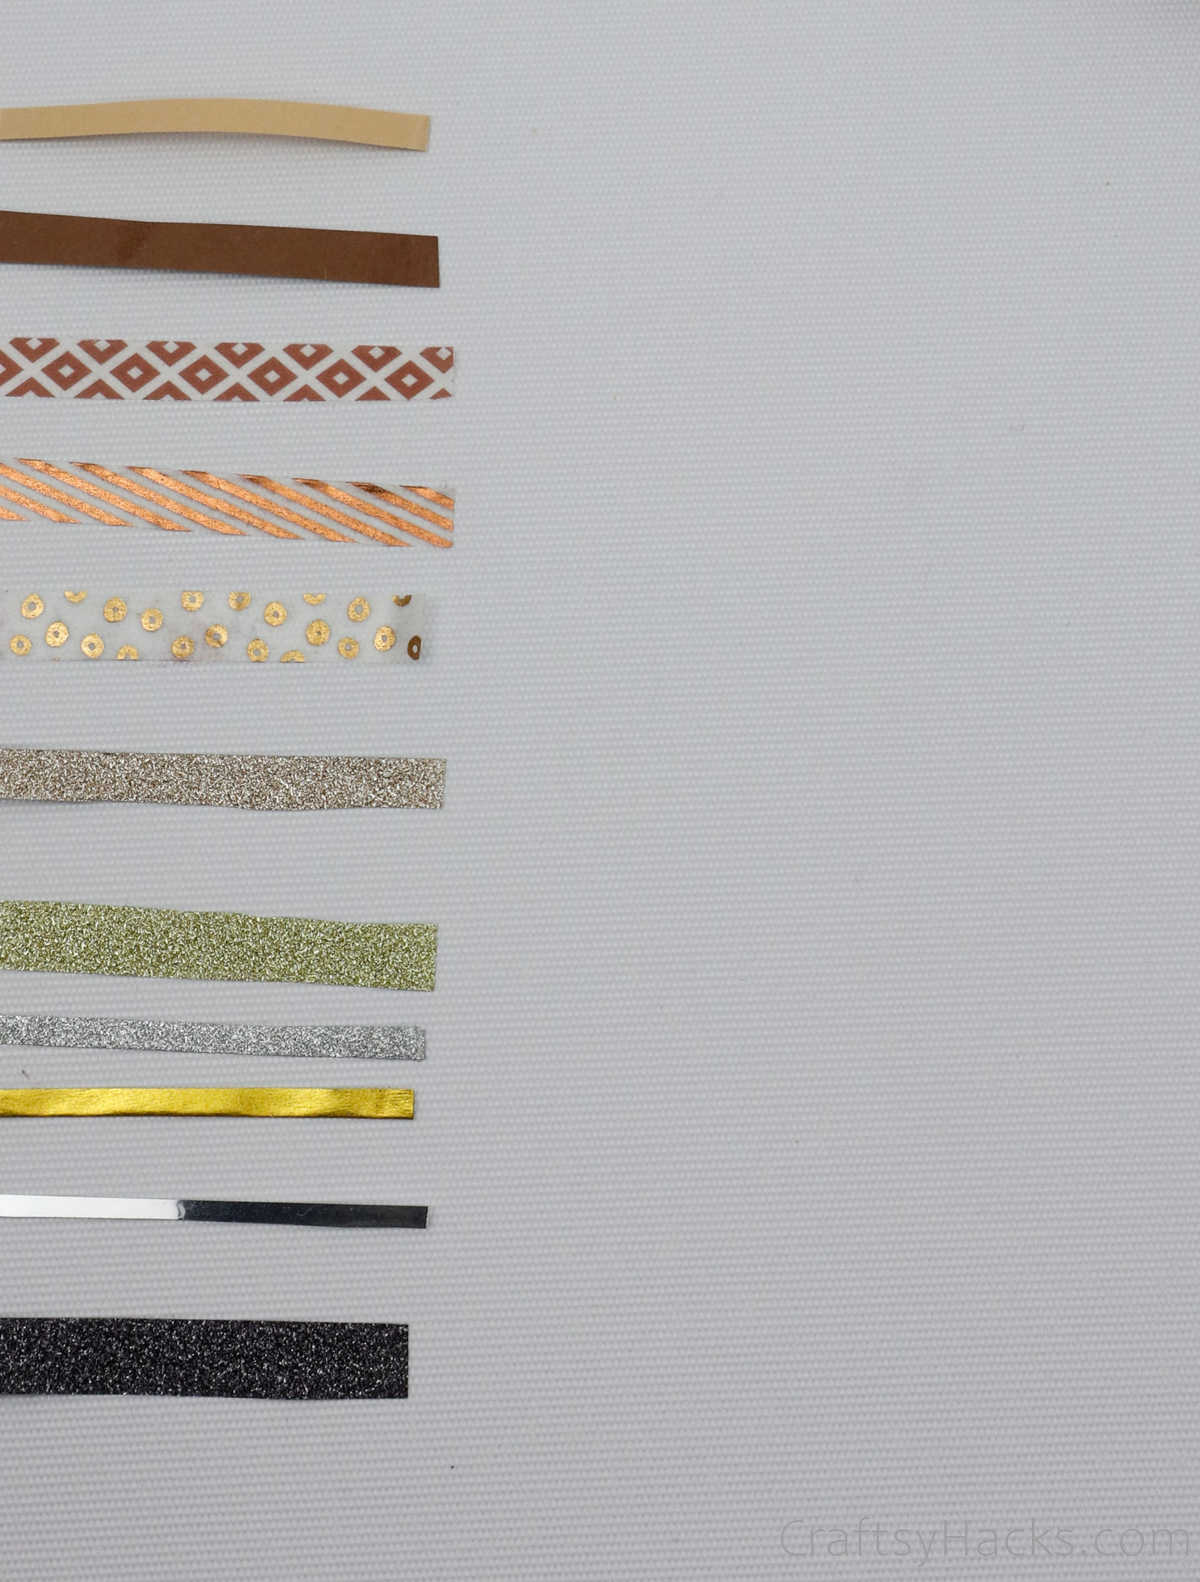 strips of washi tape